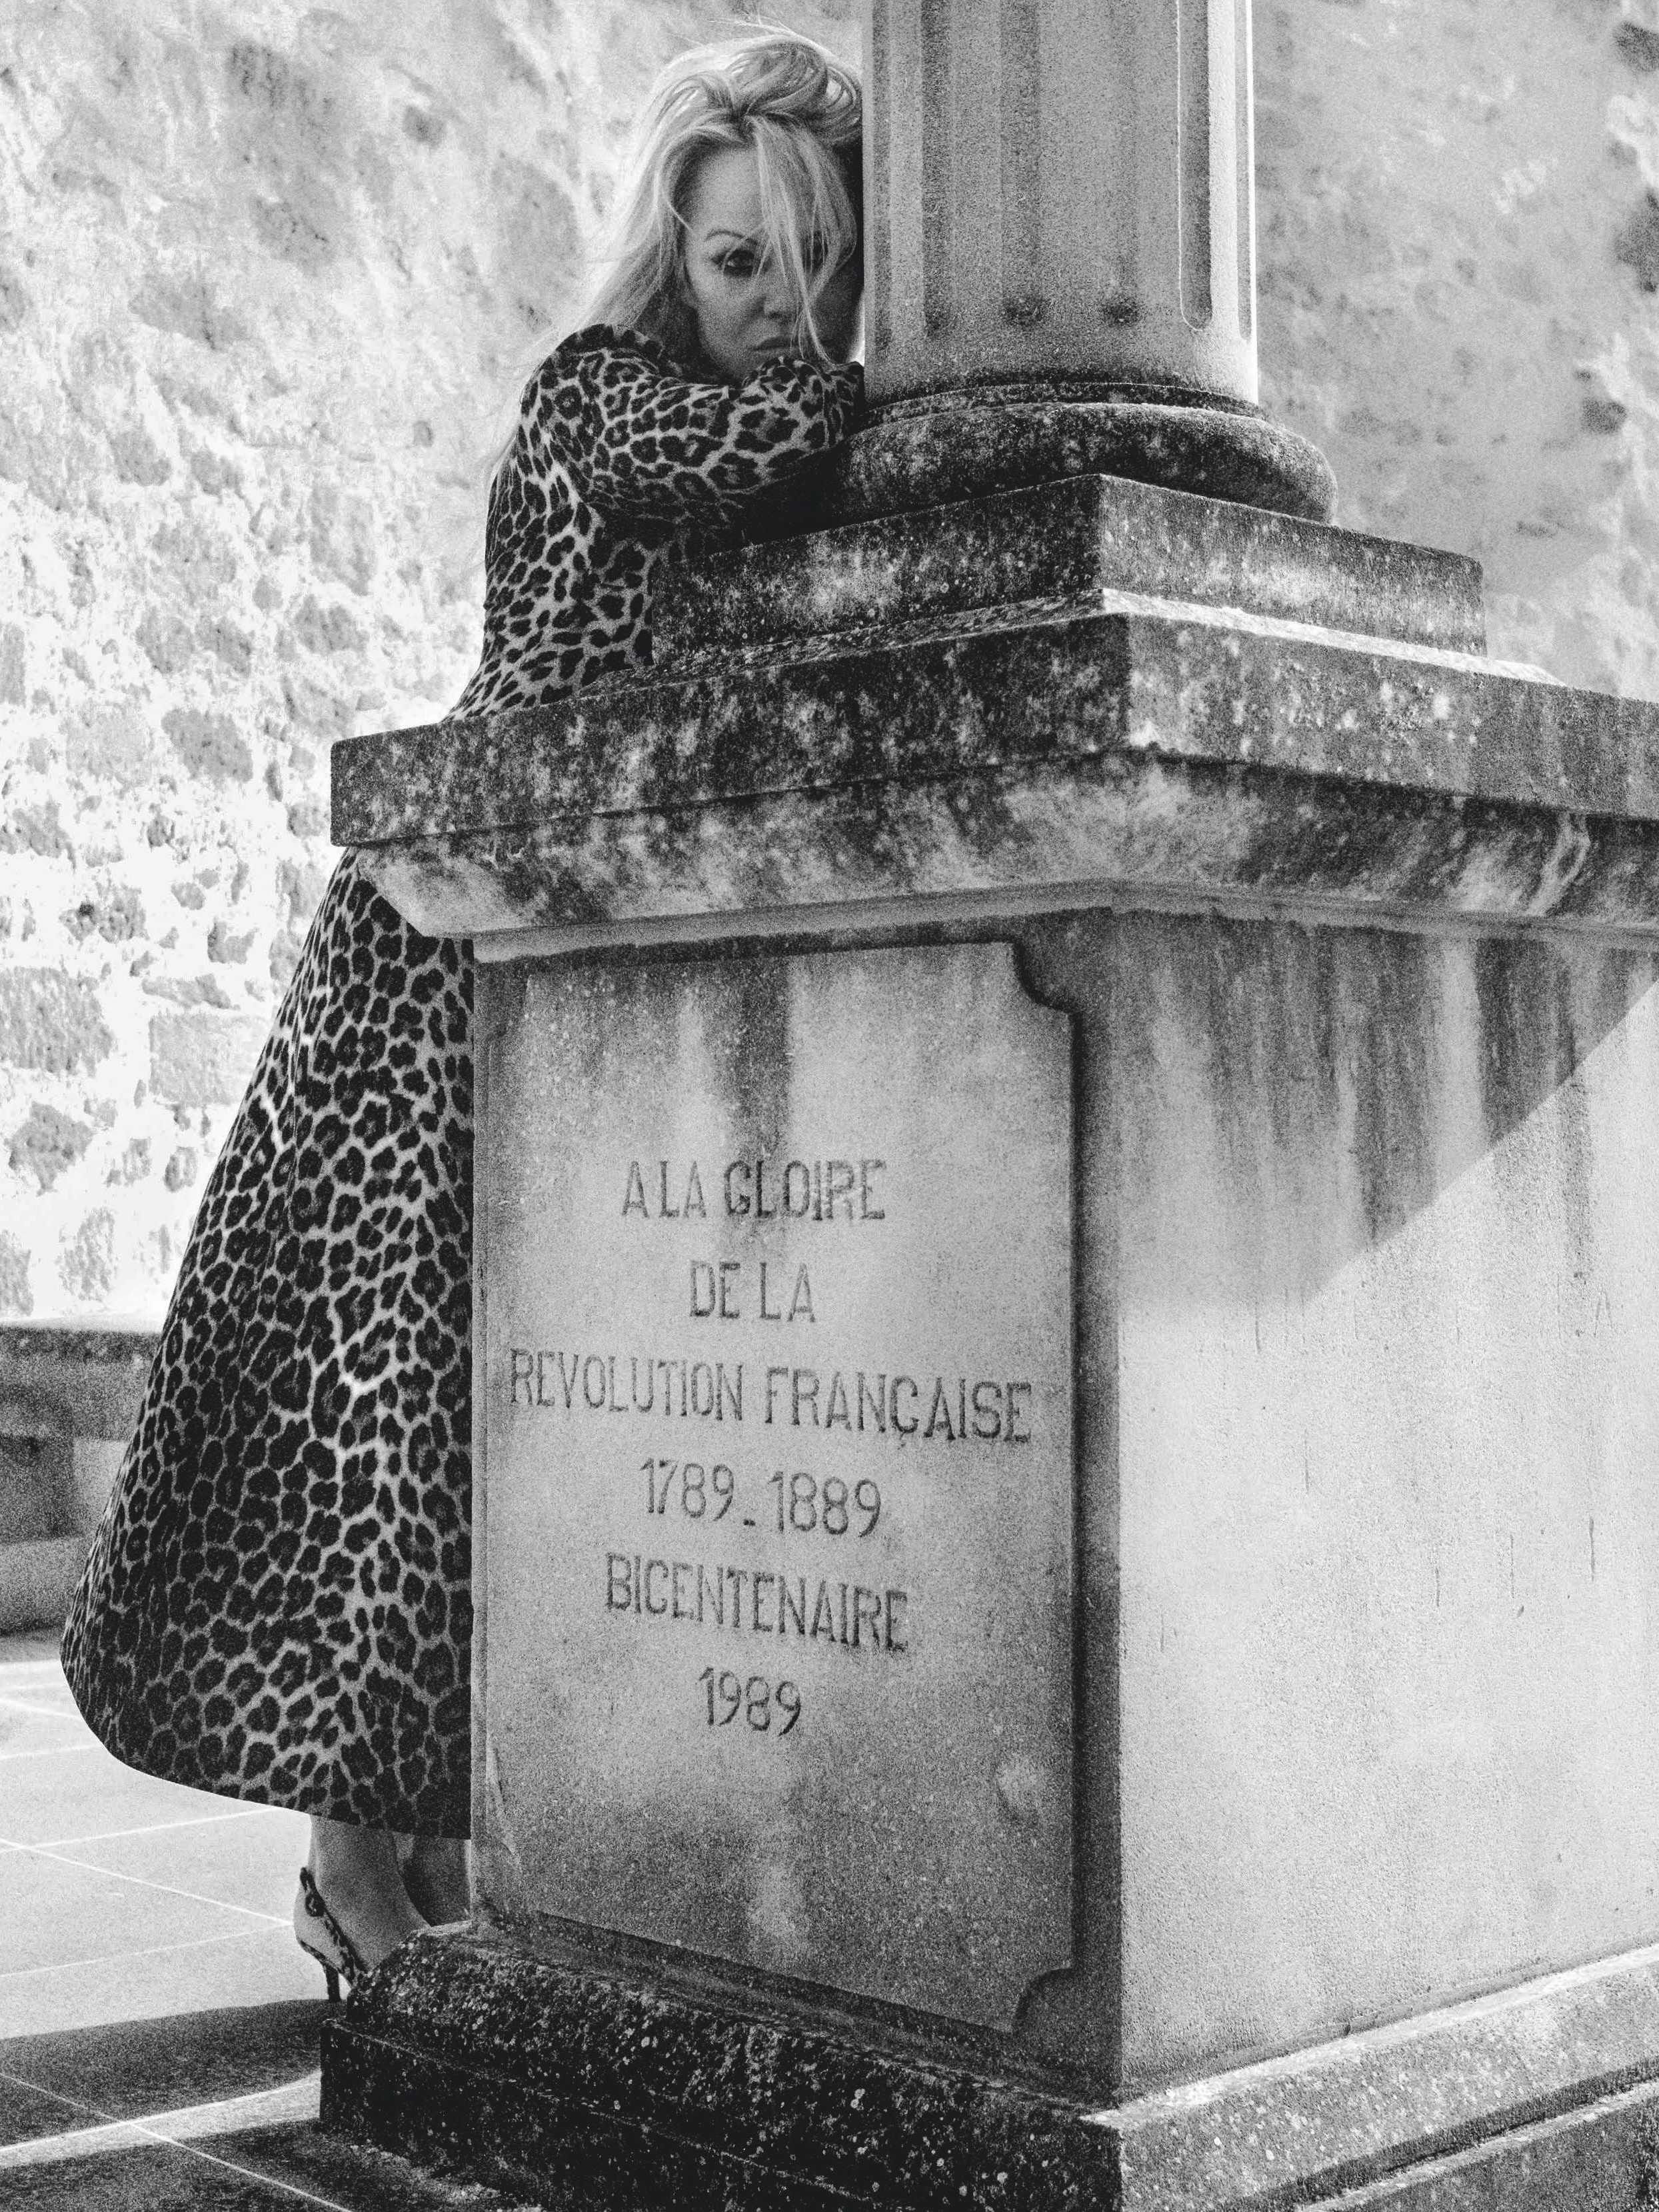 Pamela Anderson On Hefner, The Hoff & Life In The South Of France